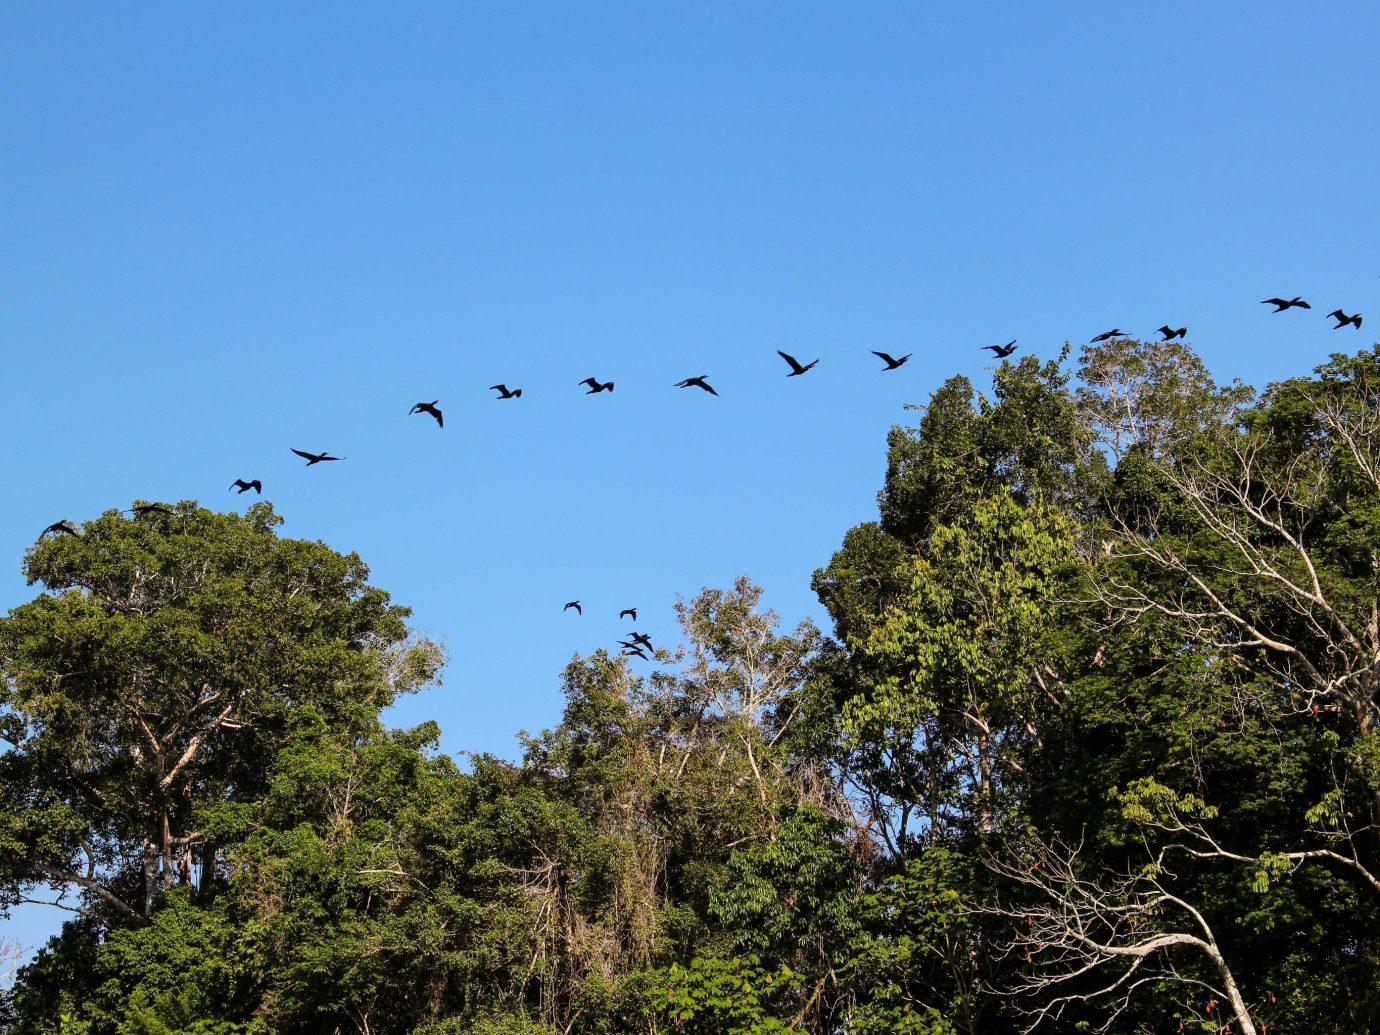 Cruise Travel Luxury Travel Outdoors + Adventure Trip Ideas tree outdoor Bird sky flock flora branch Wildlife plant